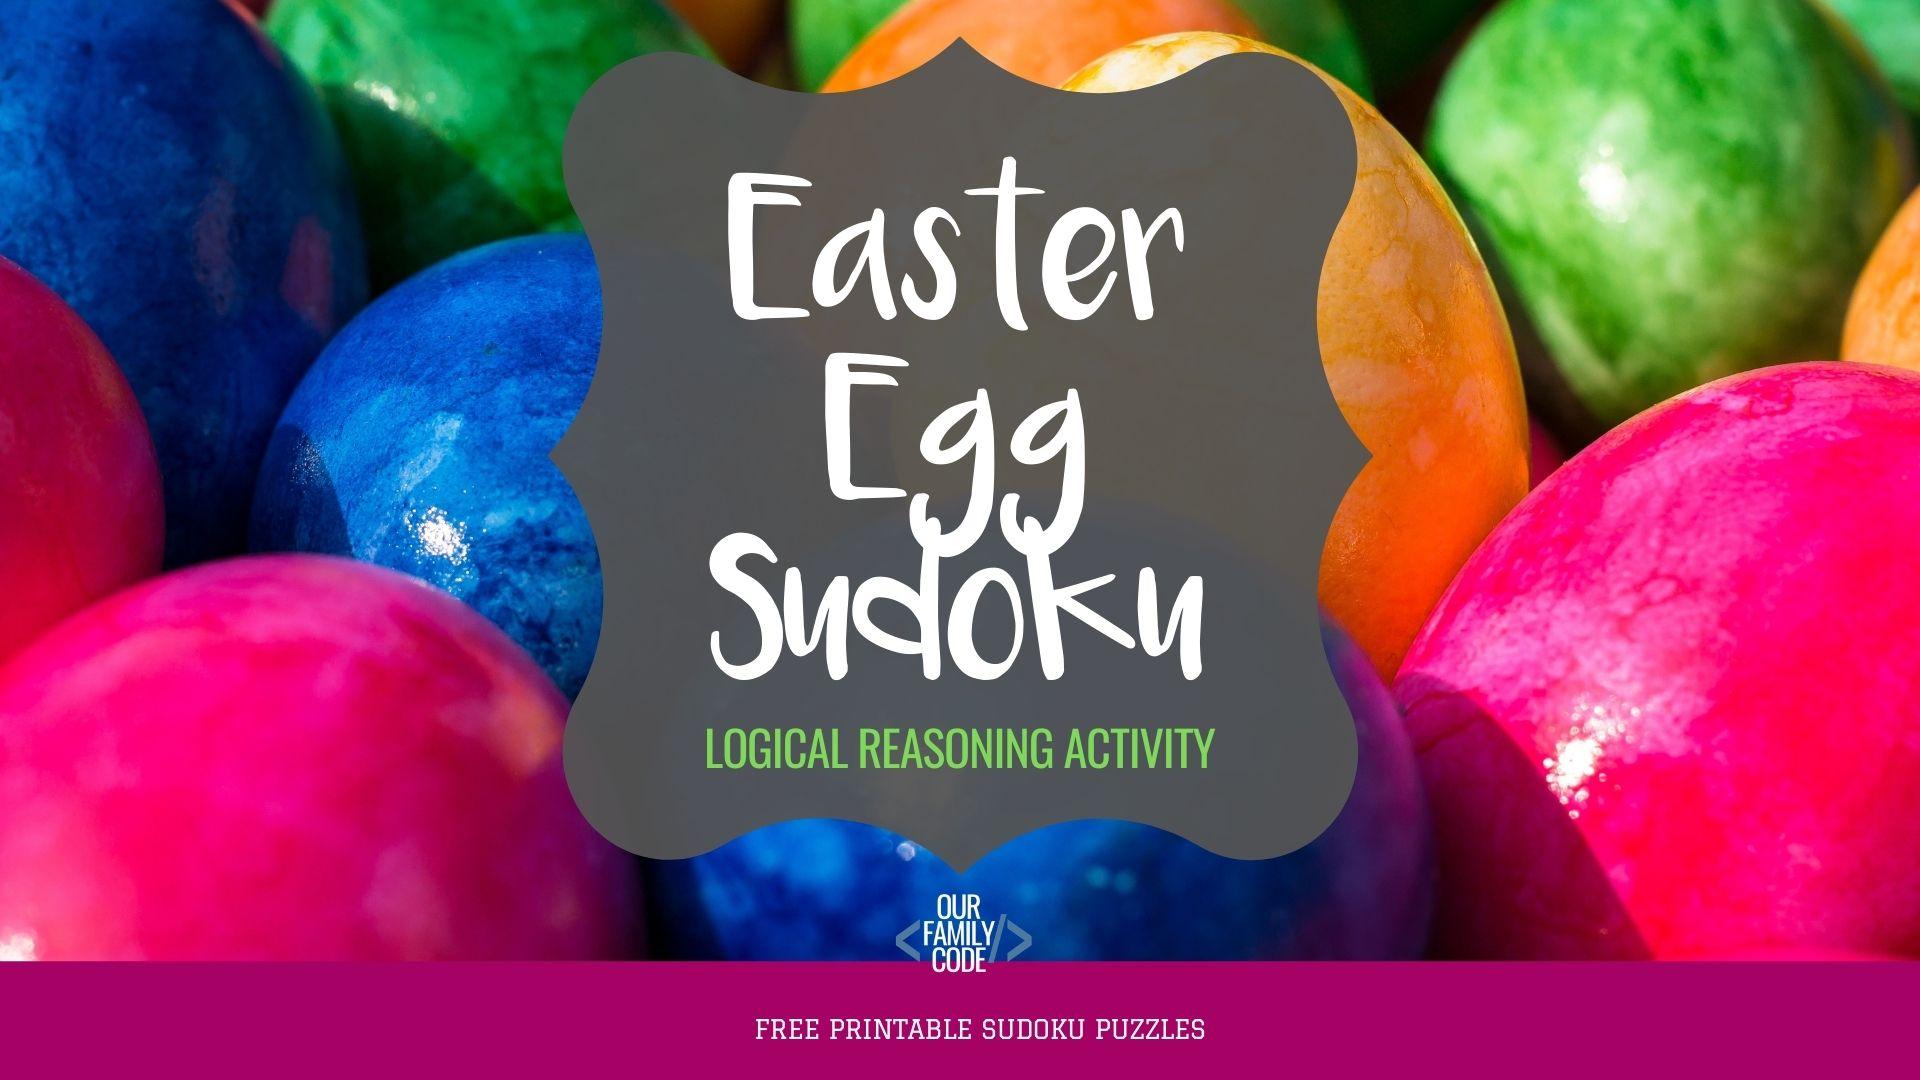 Easter Egg Sudoku Logical Reasoning Puzzle